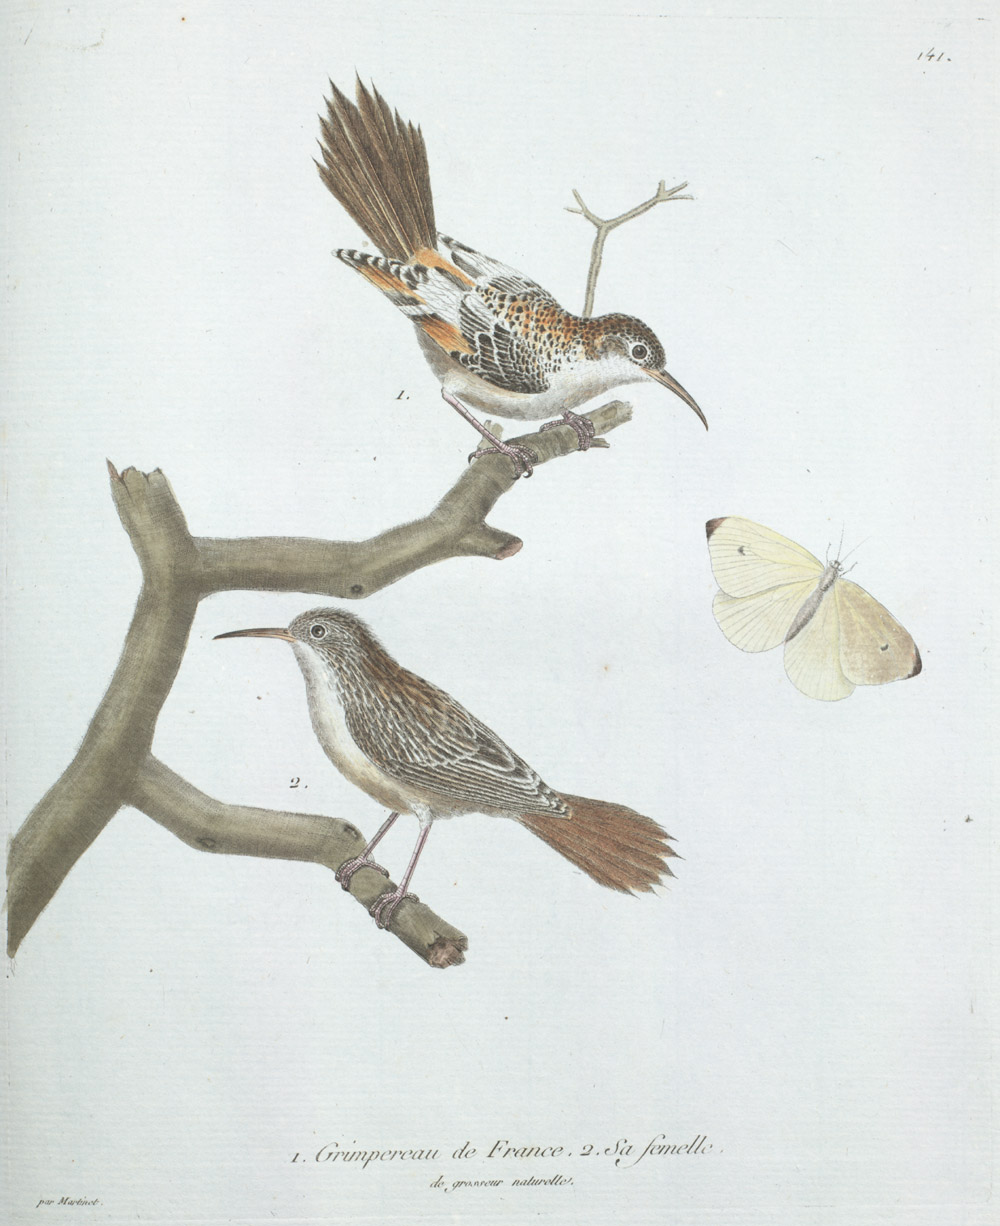 Plate 141: 1. Grimpereau de France. 2. Sa Femelle de Grosseur Naturelle,  Image number:SIL13-1-287b